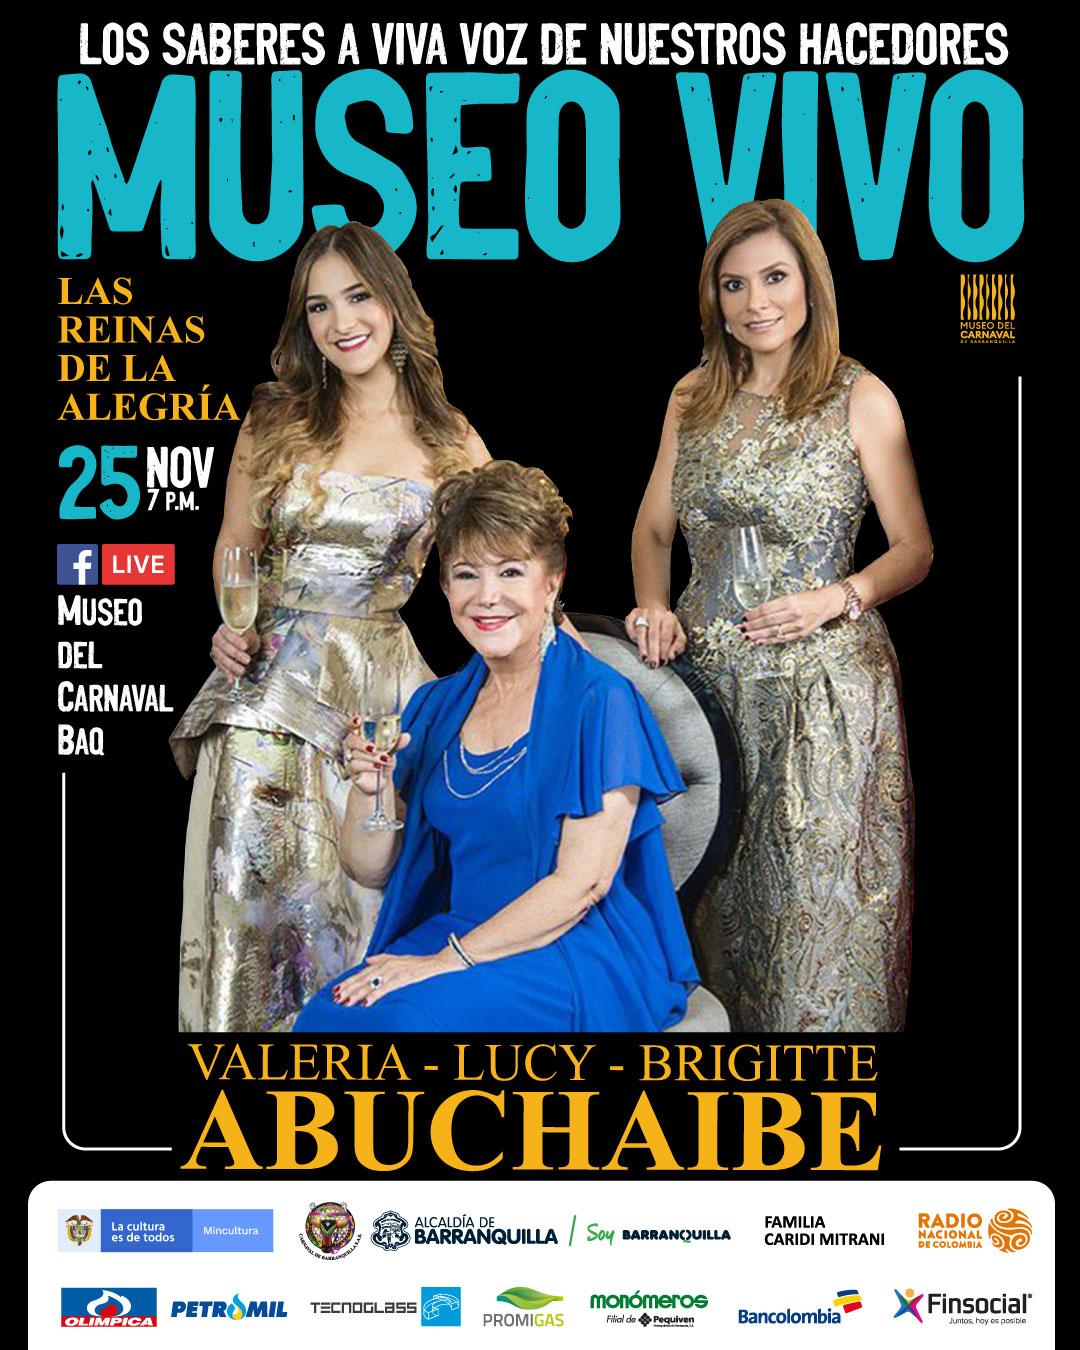 Mañana en Museo en Vivo conversatorio con la Dinastía Abuchaibe